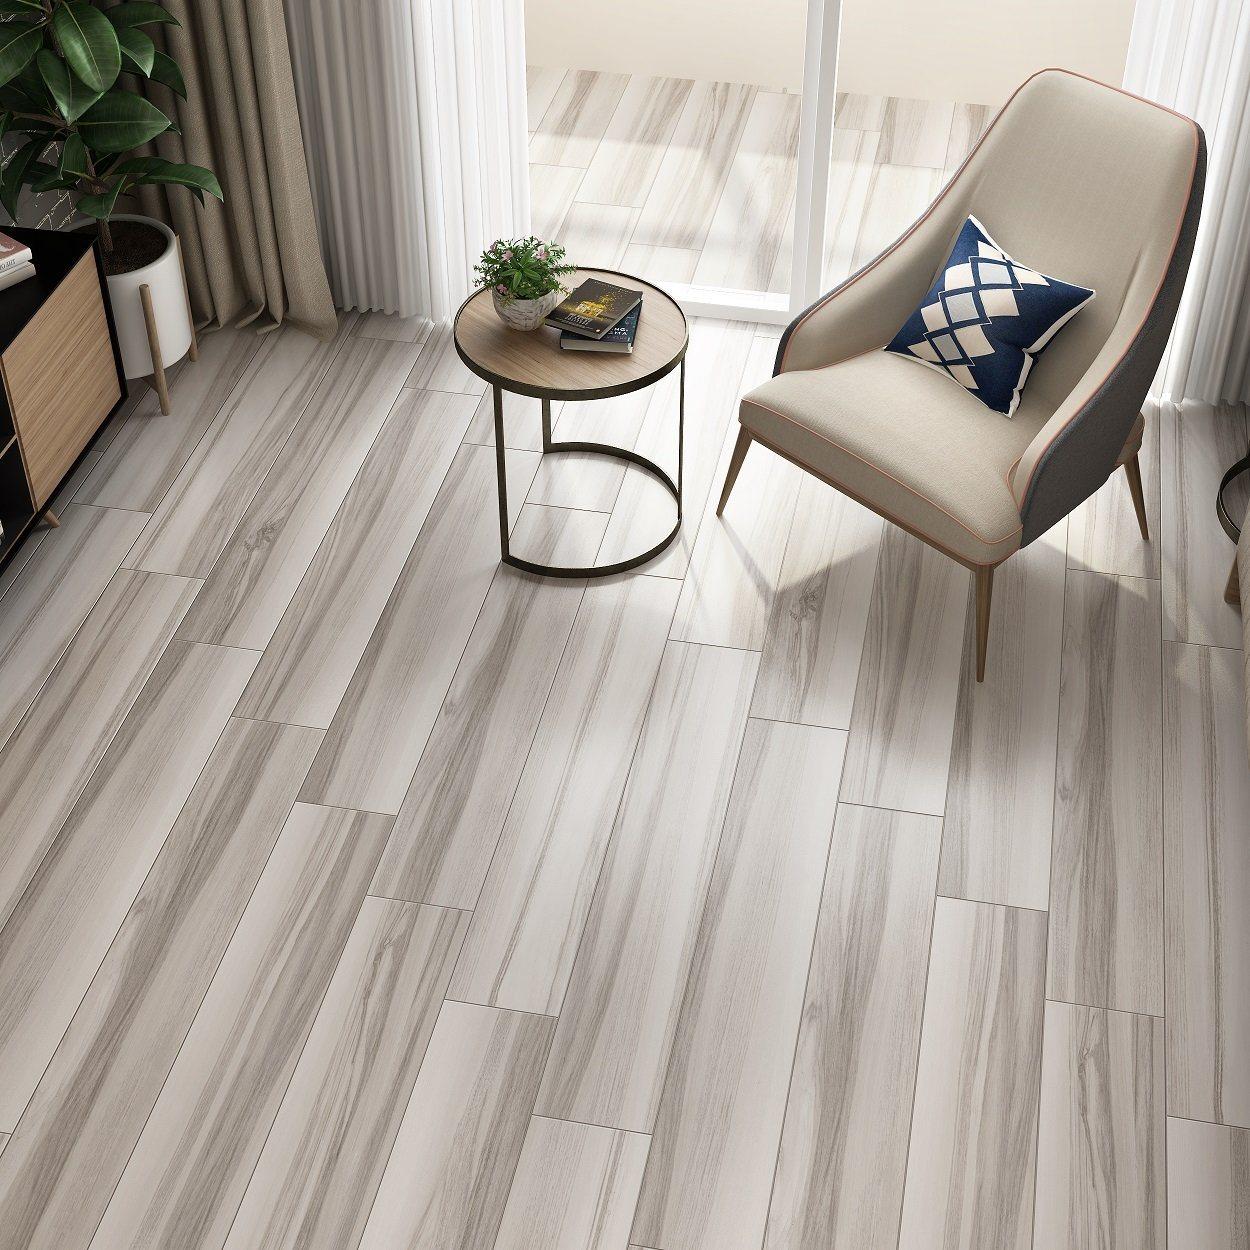 China Porcelain Wood Plank Tile Timber